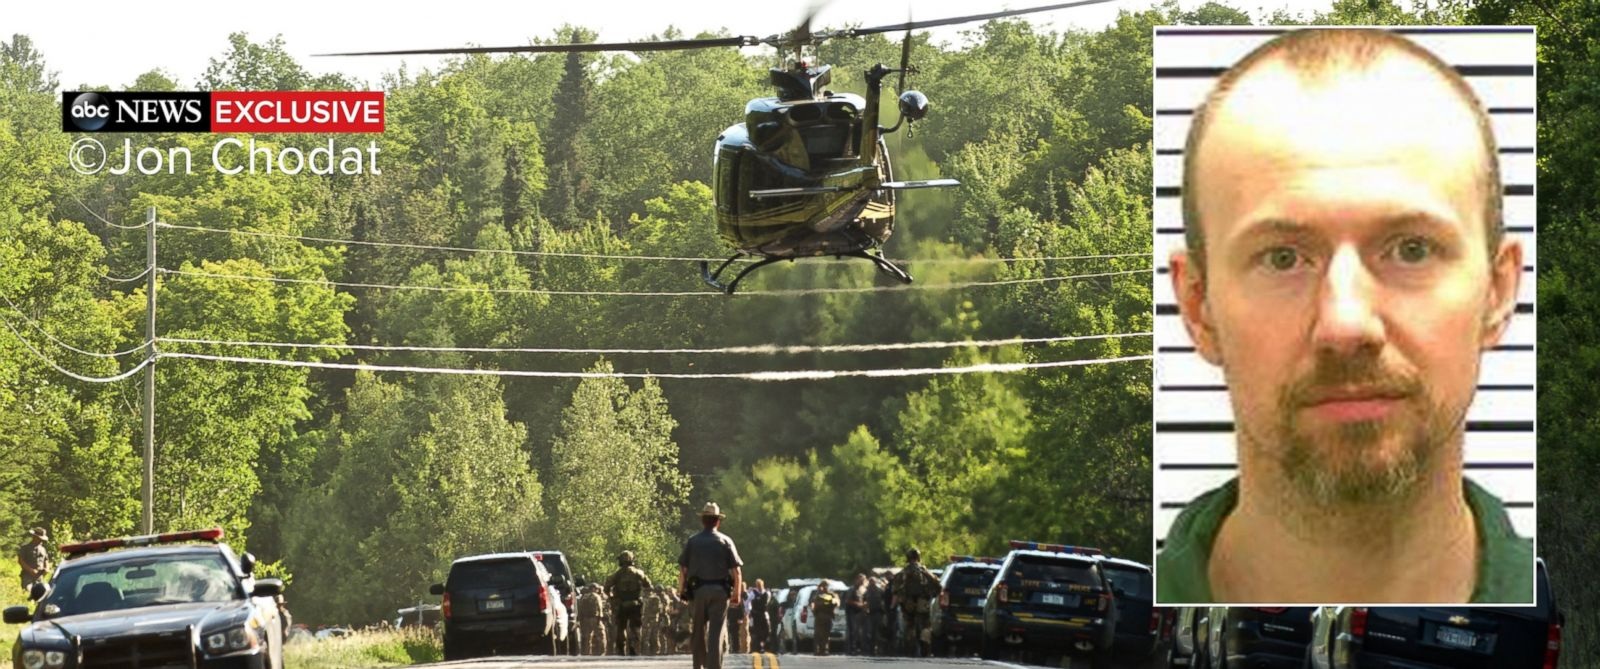 PHOTO: Authorities in upstate New York spent three weeks searching for escaped prisoners Richard Matt and David Sweat.